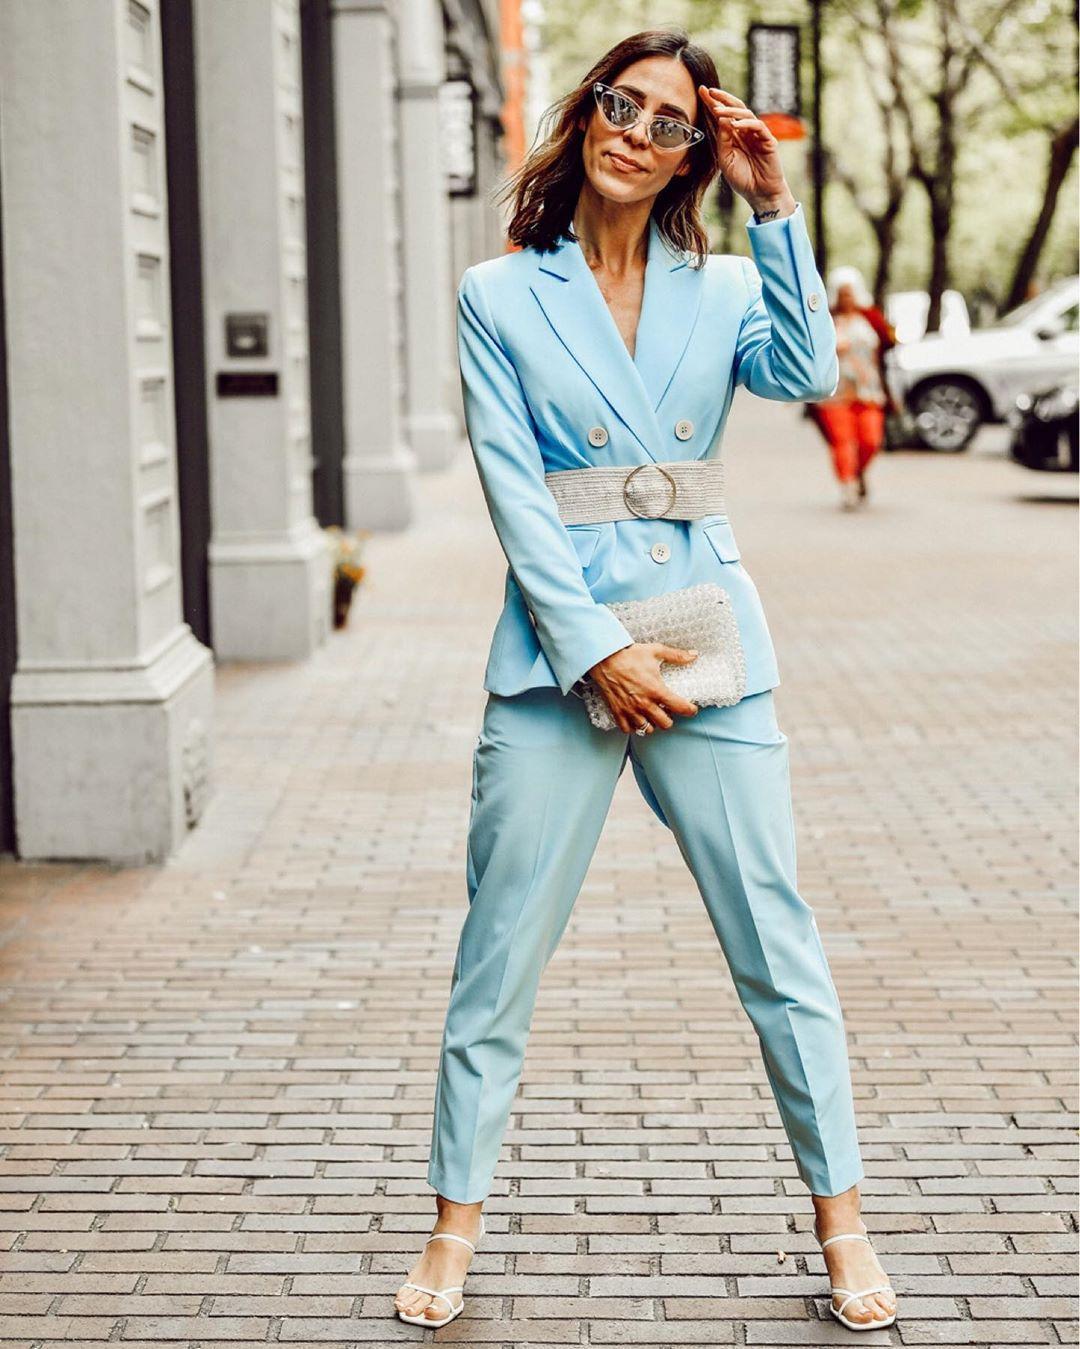 jacket, blazer, blue pants, suit, double breasted, topshop, white sandals, bag - Wheretoget